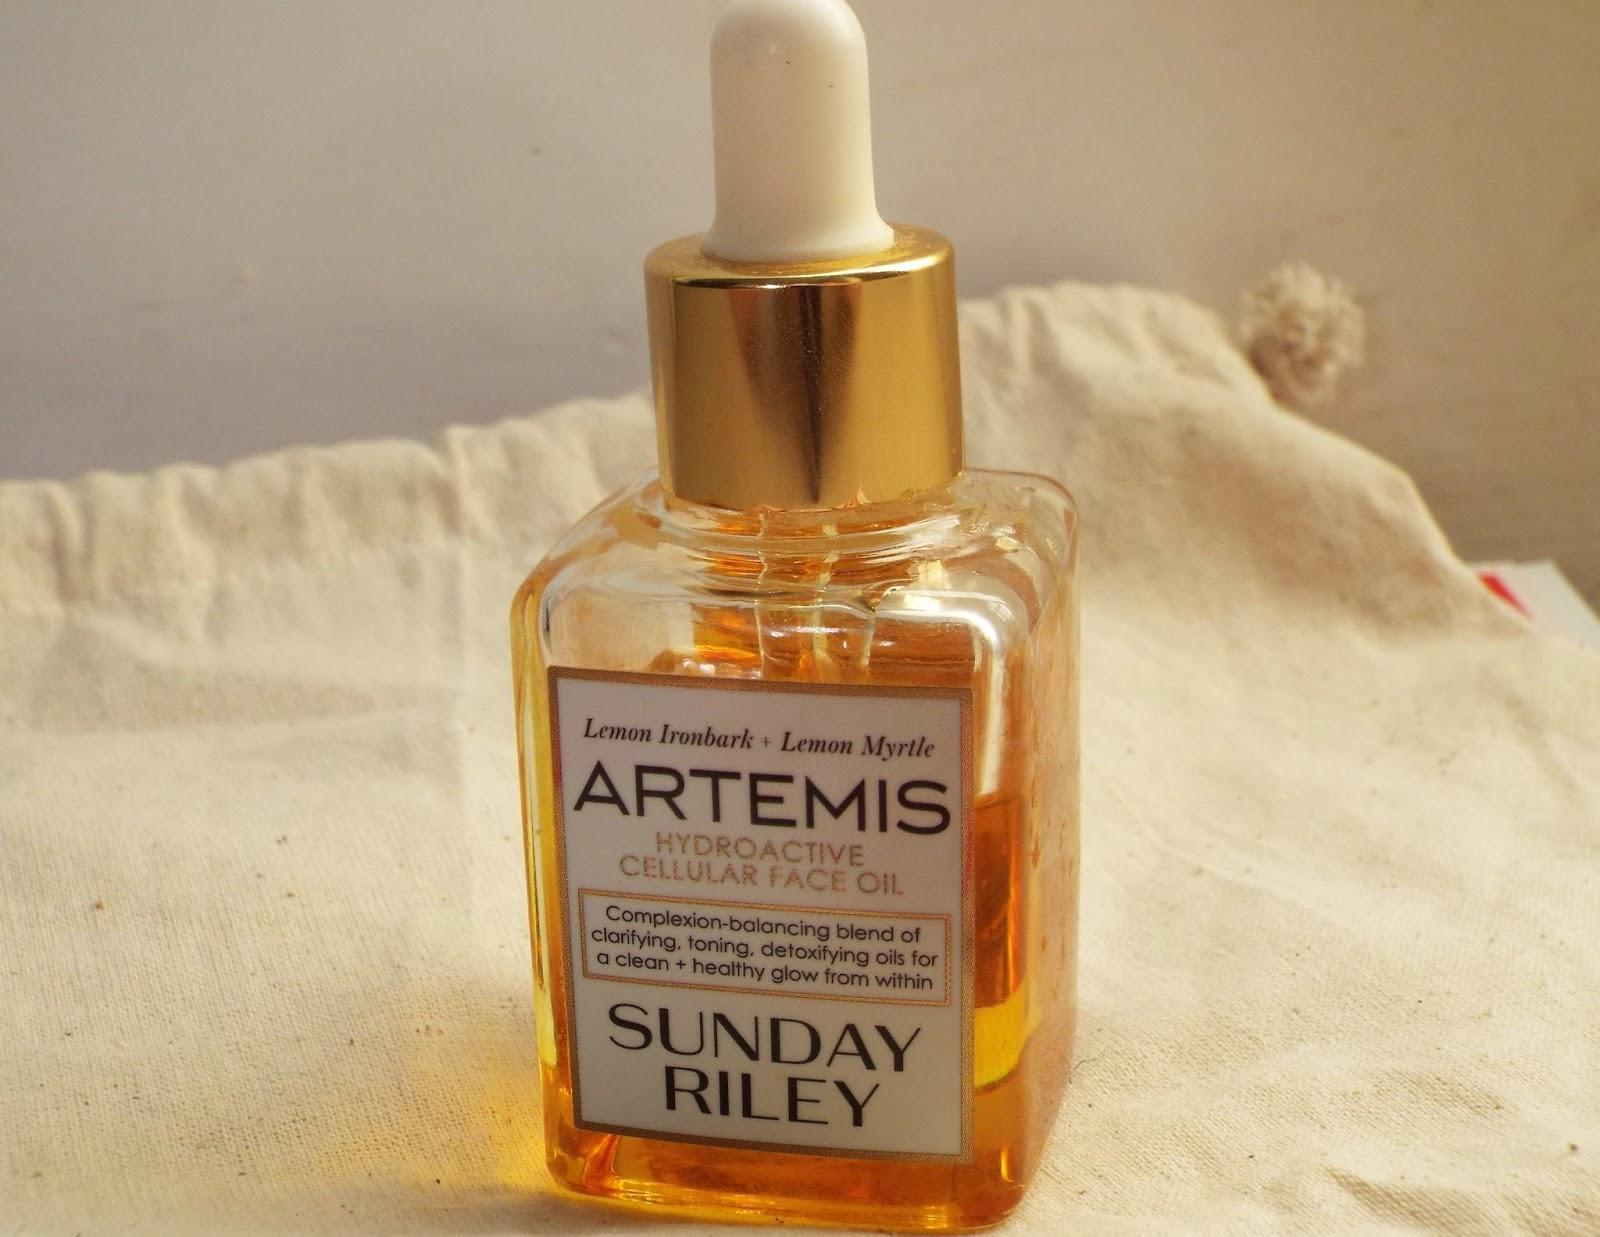 sunday riley artemis